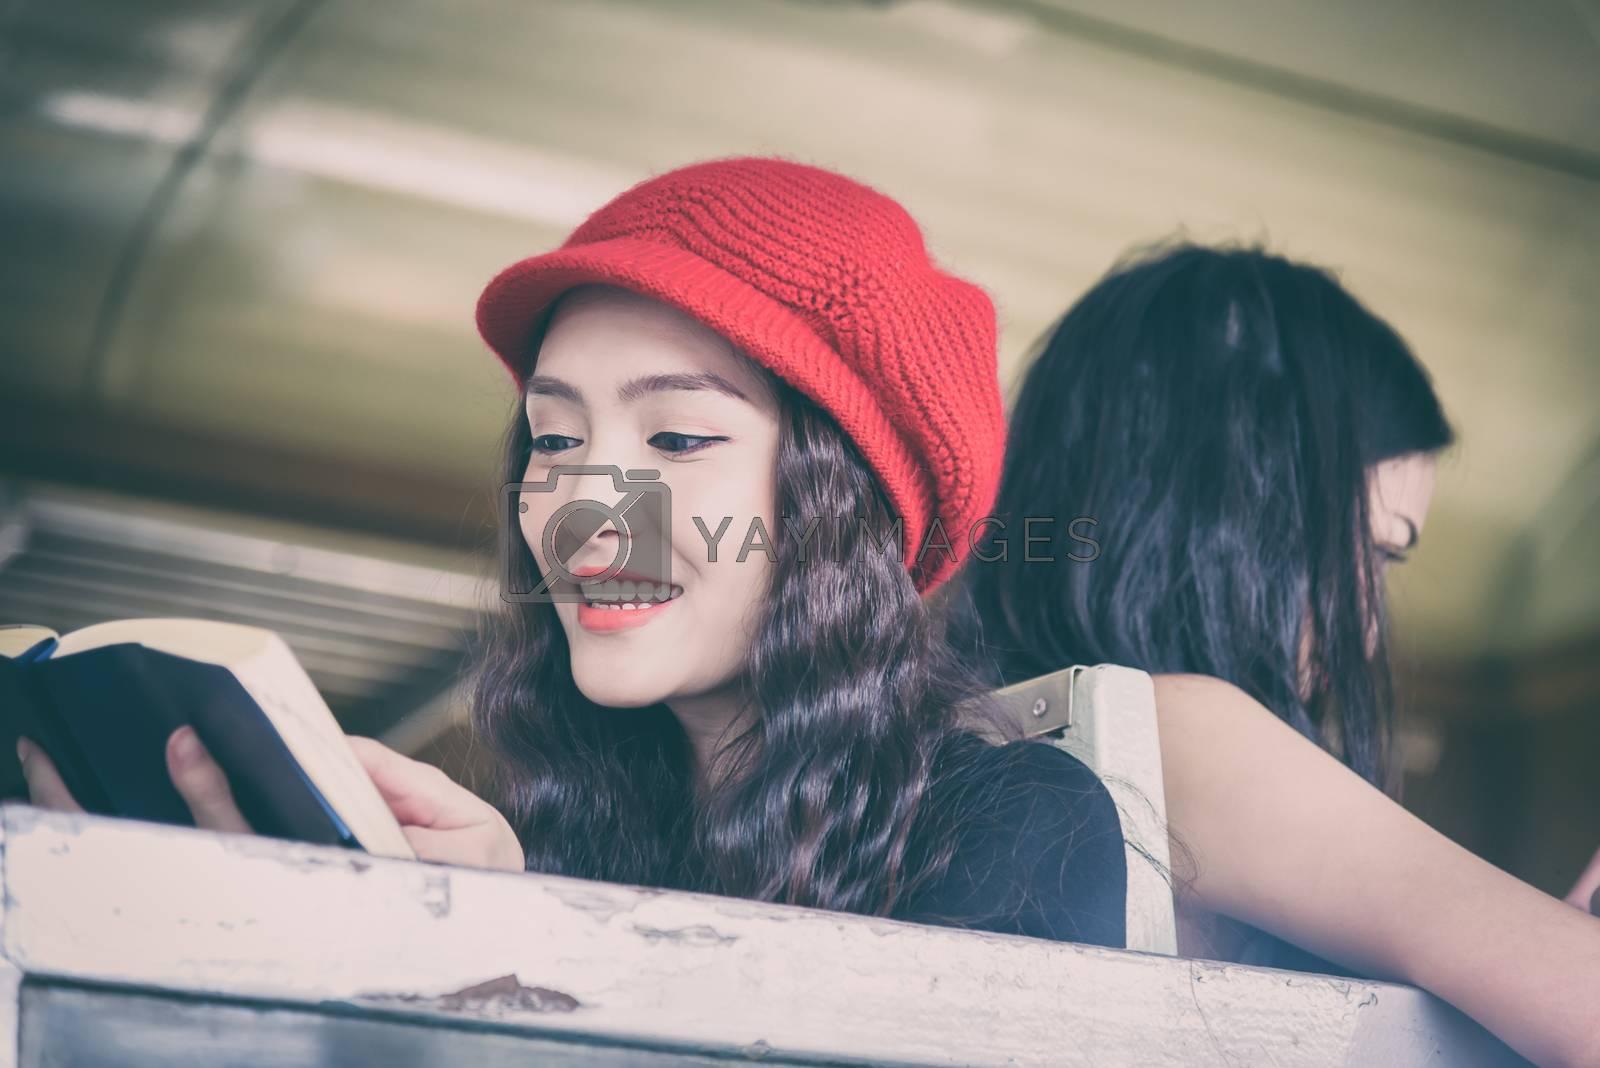 Asian women traveler have reading a book and talking in the train with happiness at Hua Lamphong station at Bangkok, Thailand.